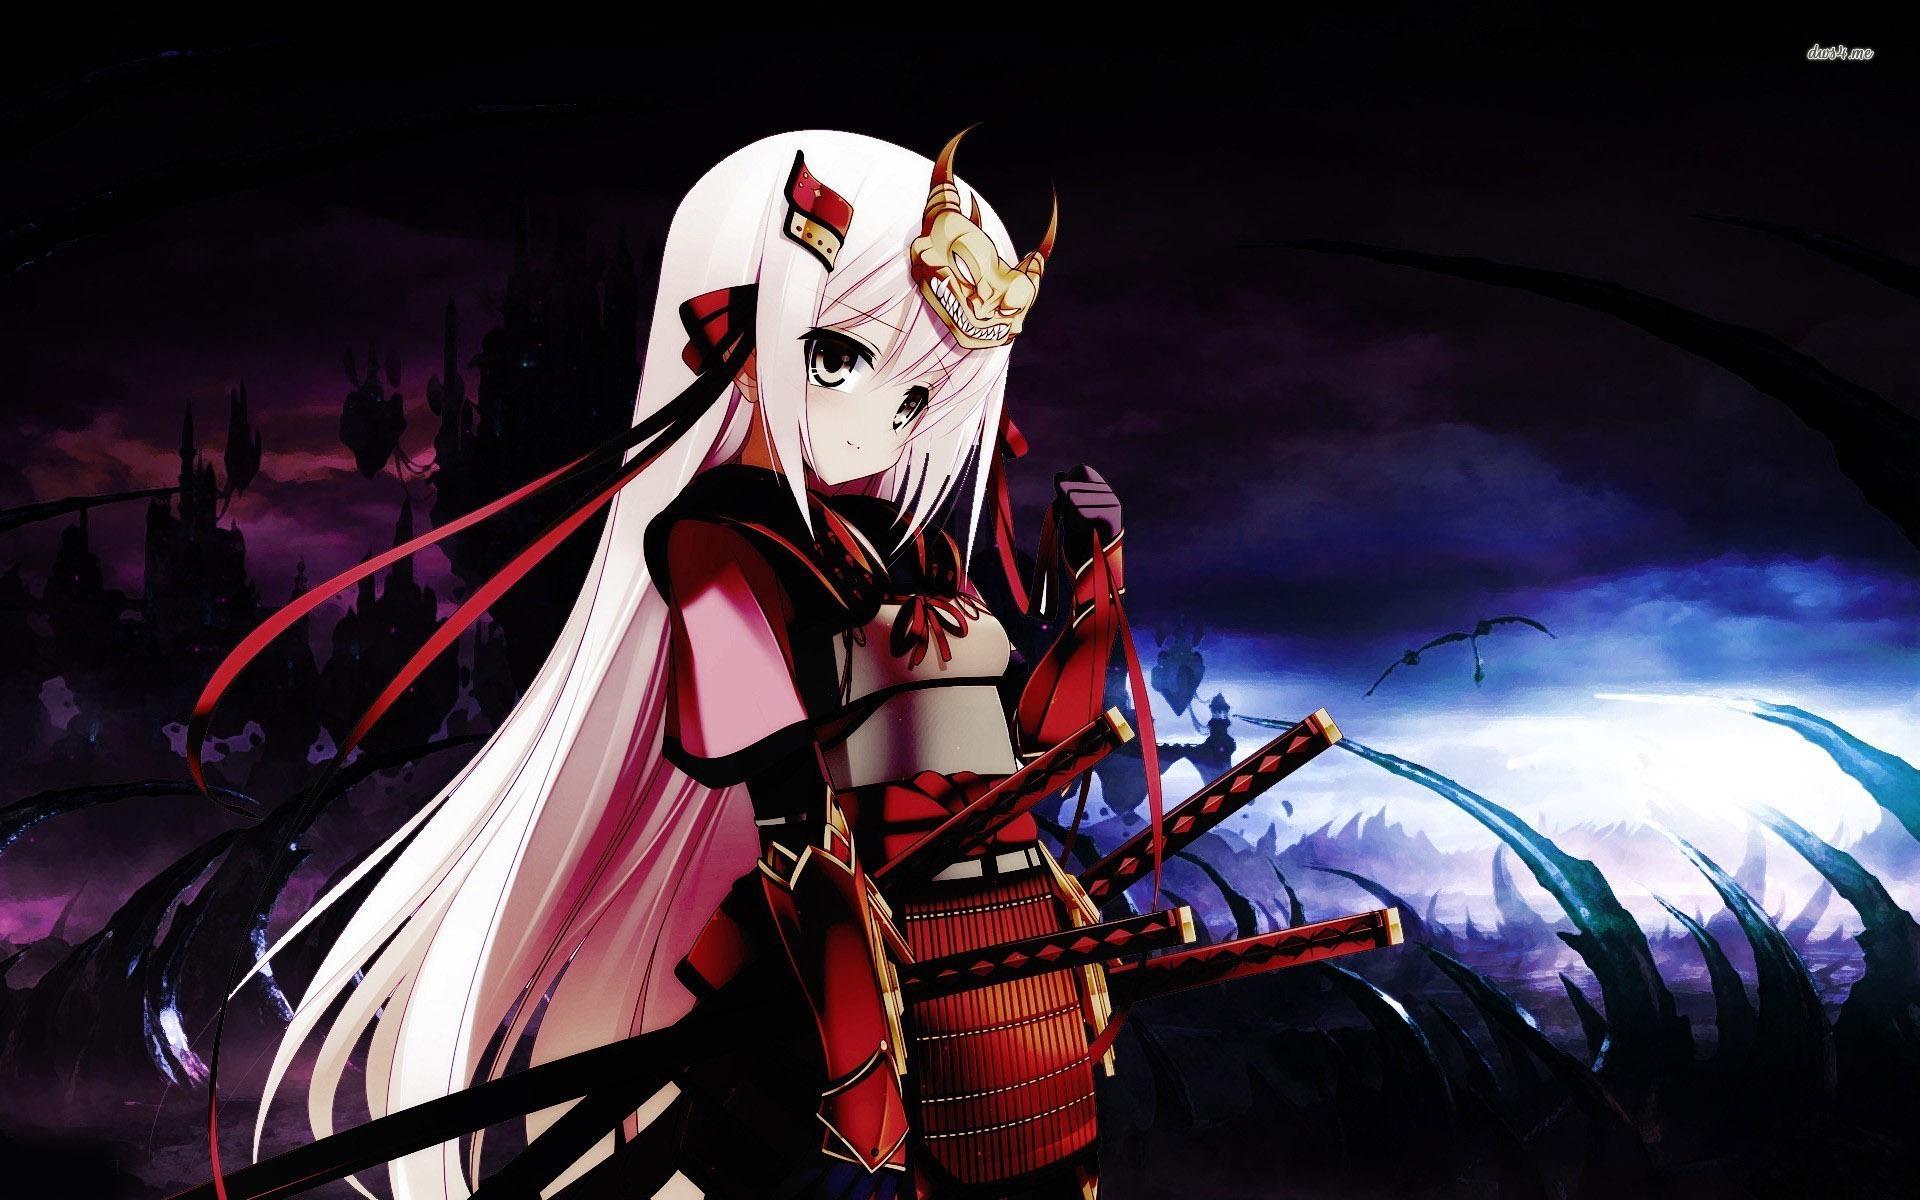 Samurai girl wallpaper   Anime wallpapers   14680 1920x1200